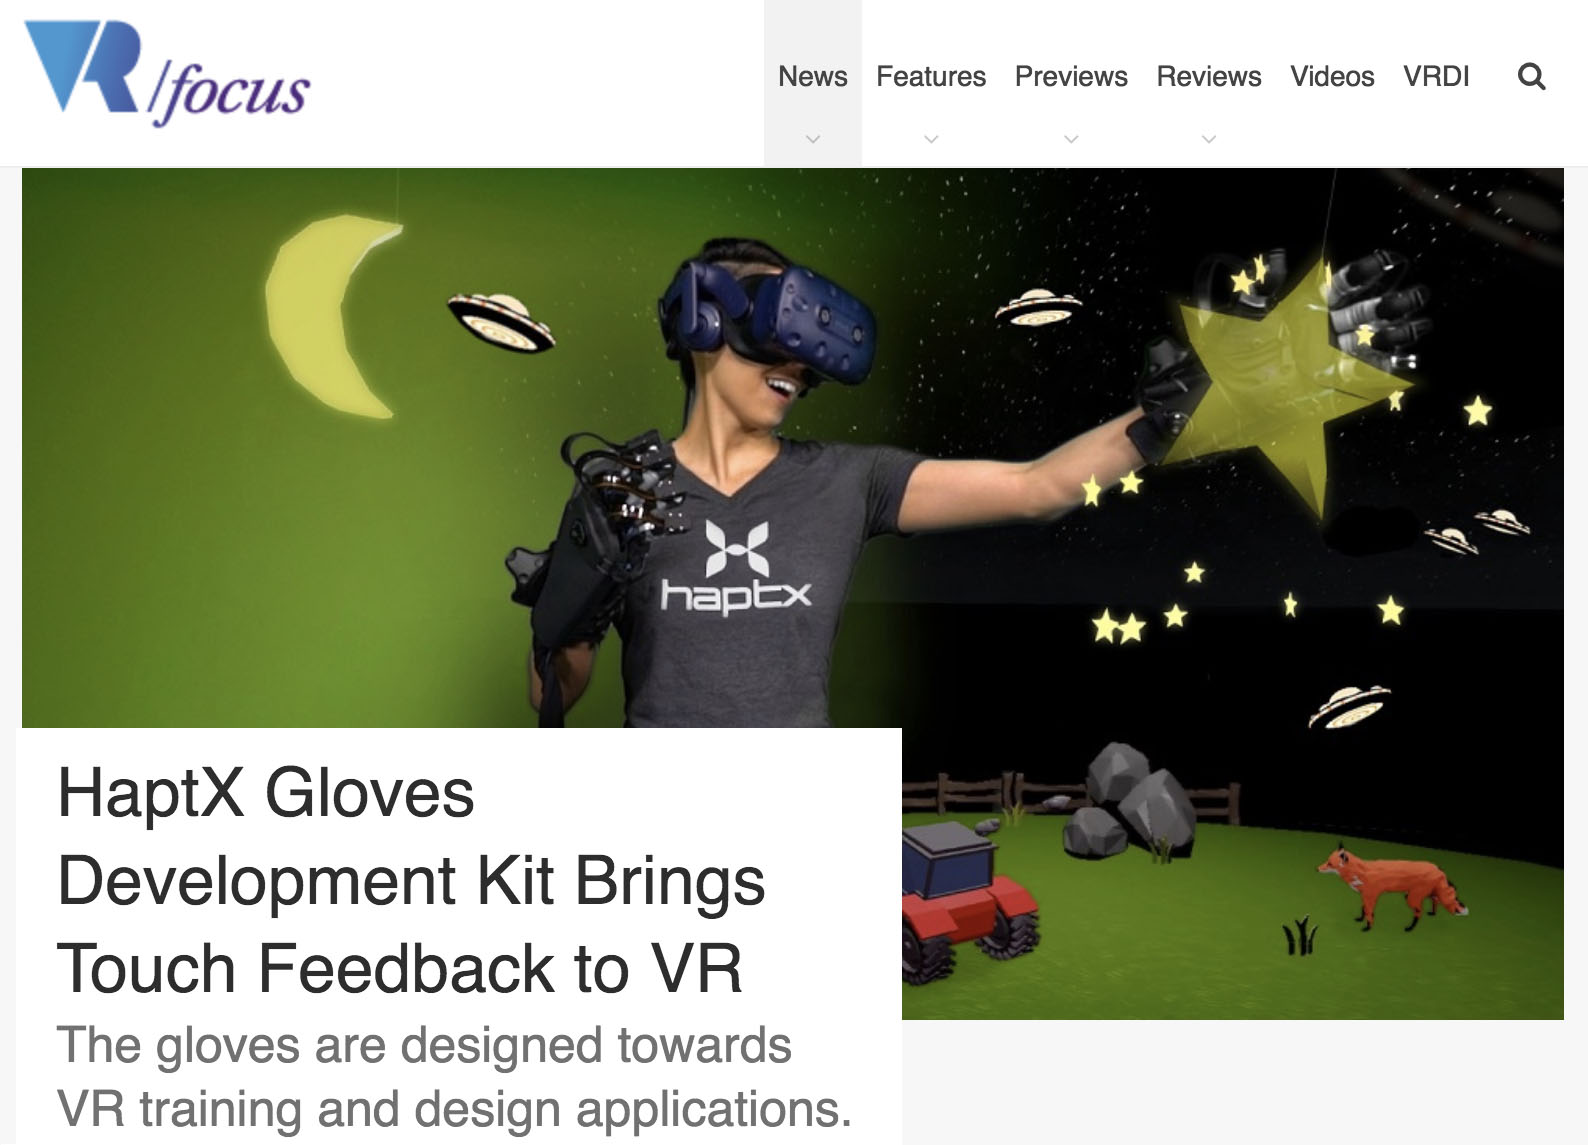 VR+Focus.jpg